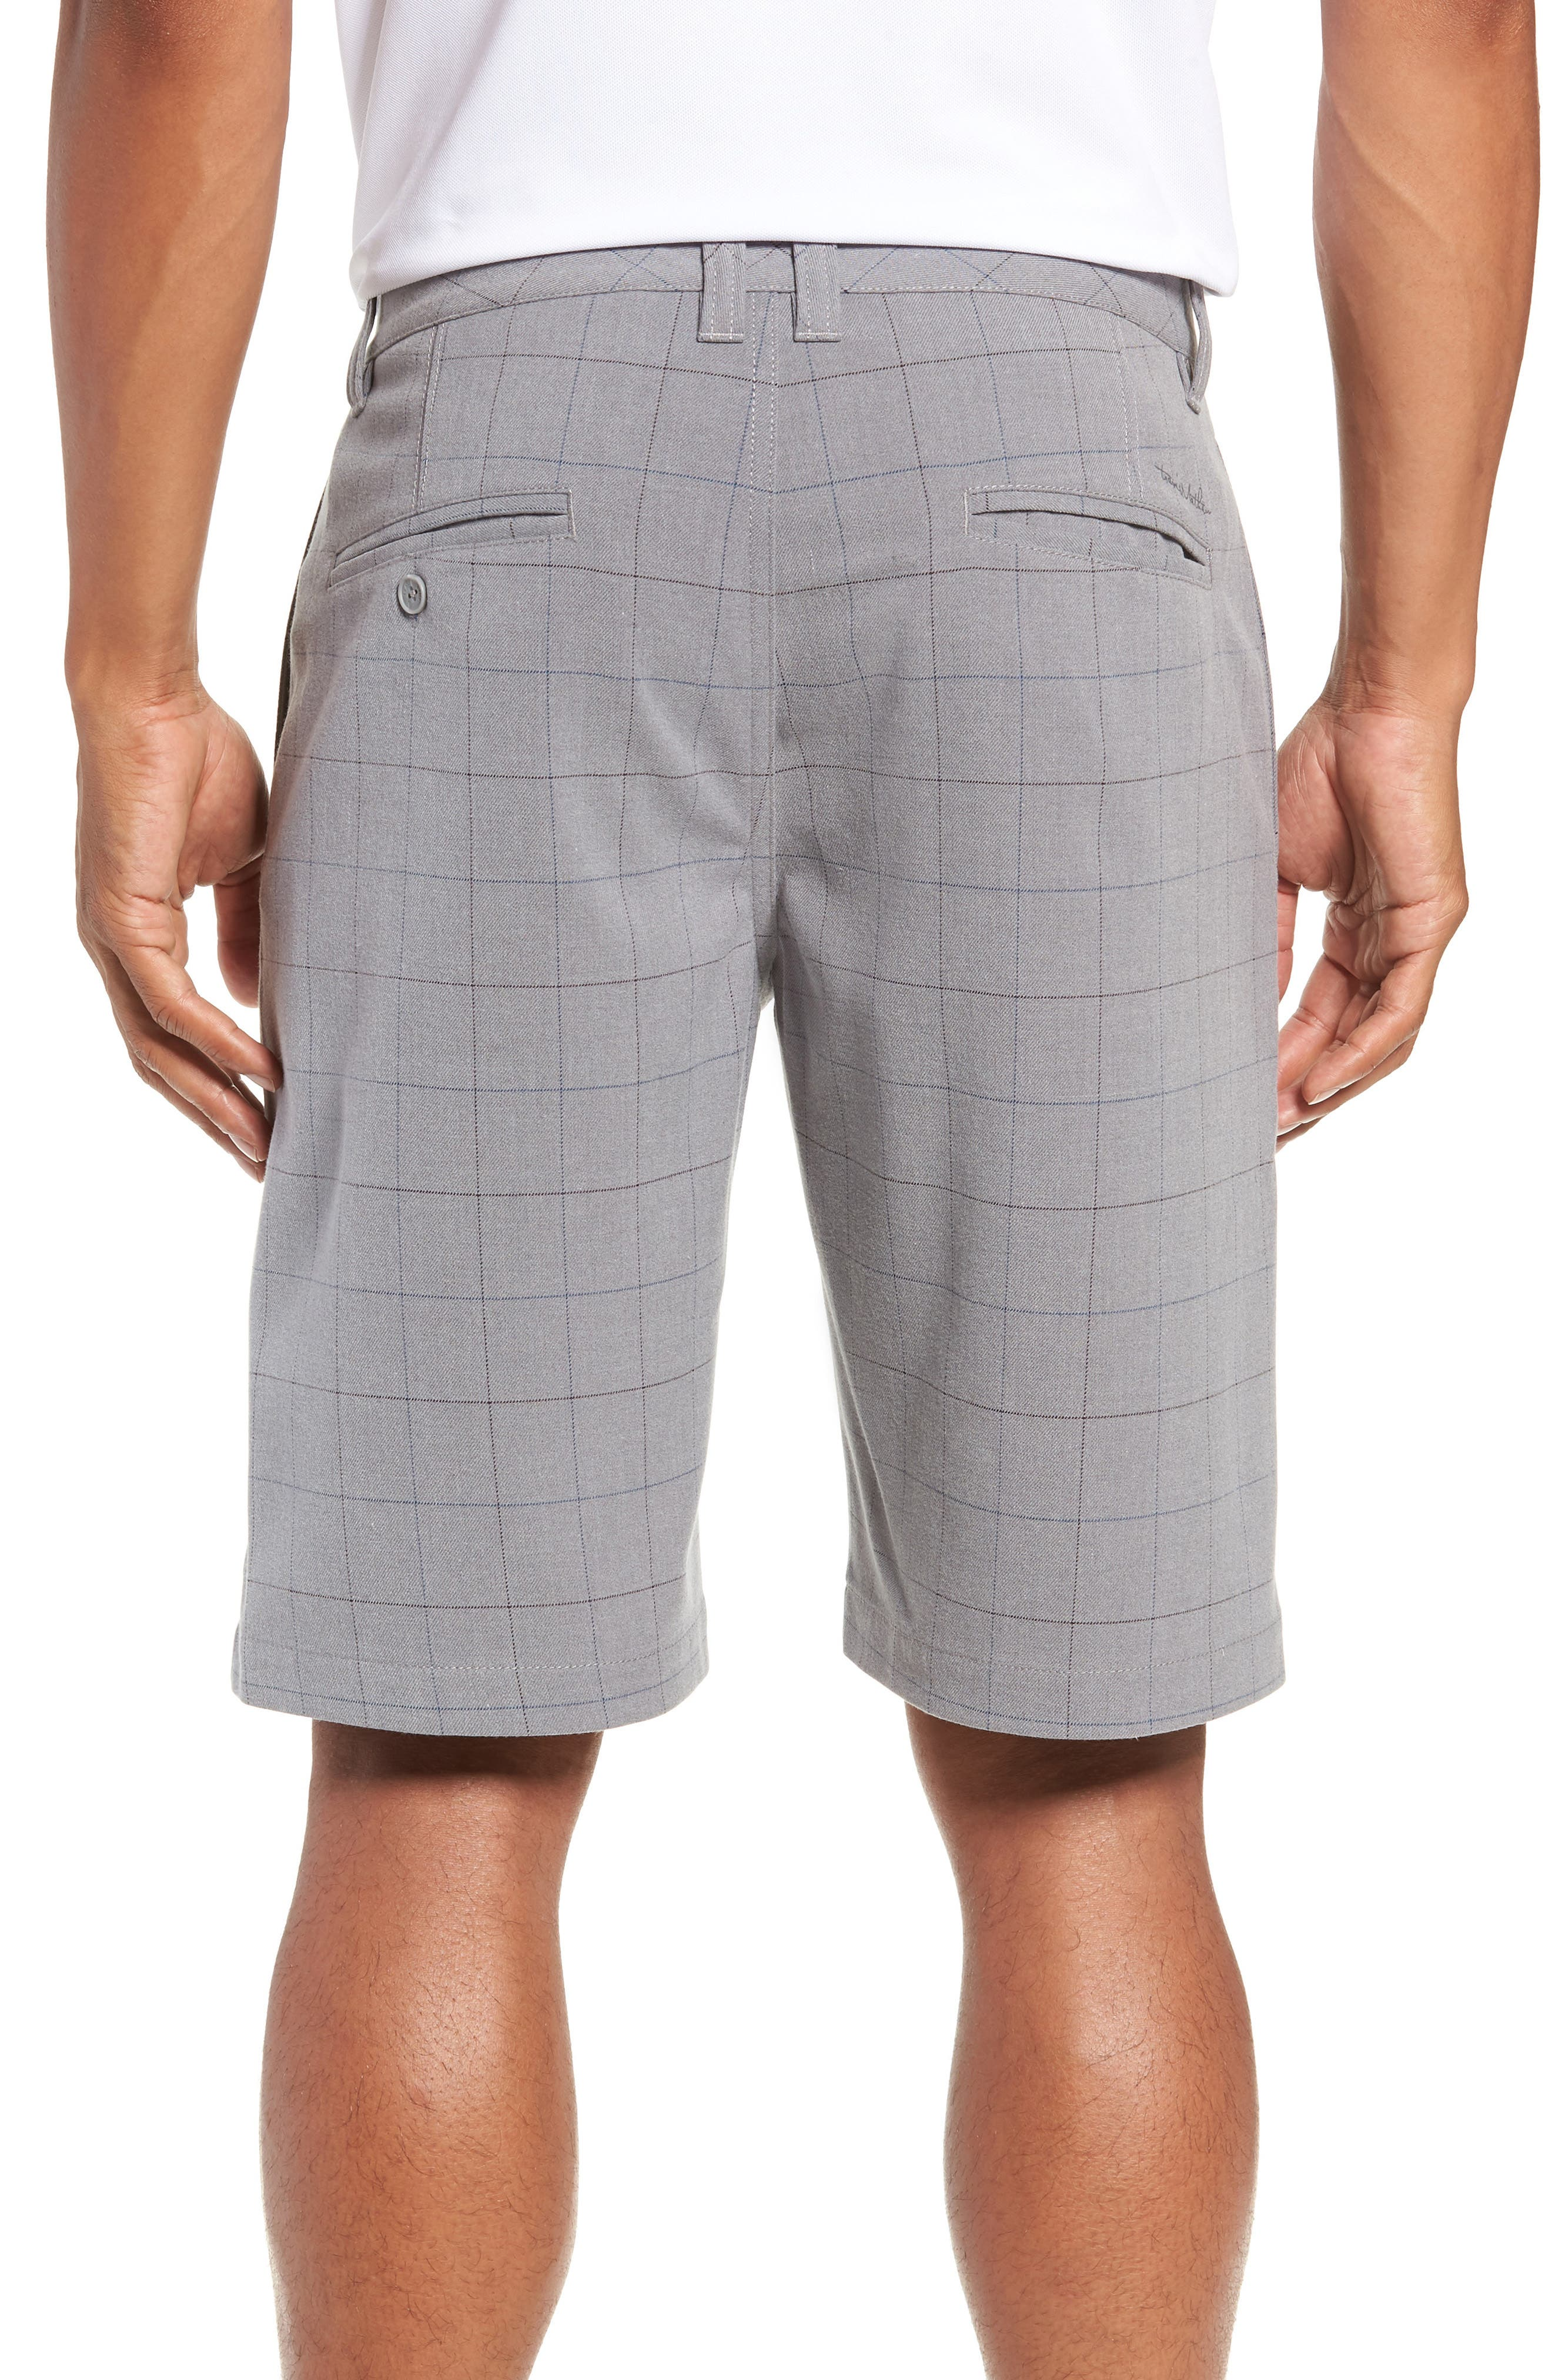 Rickles Regular Fit Shorts,                             Alternate thumbnail 2, color,                             HEATHER SHARKSKIN